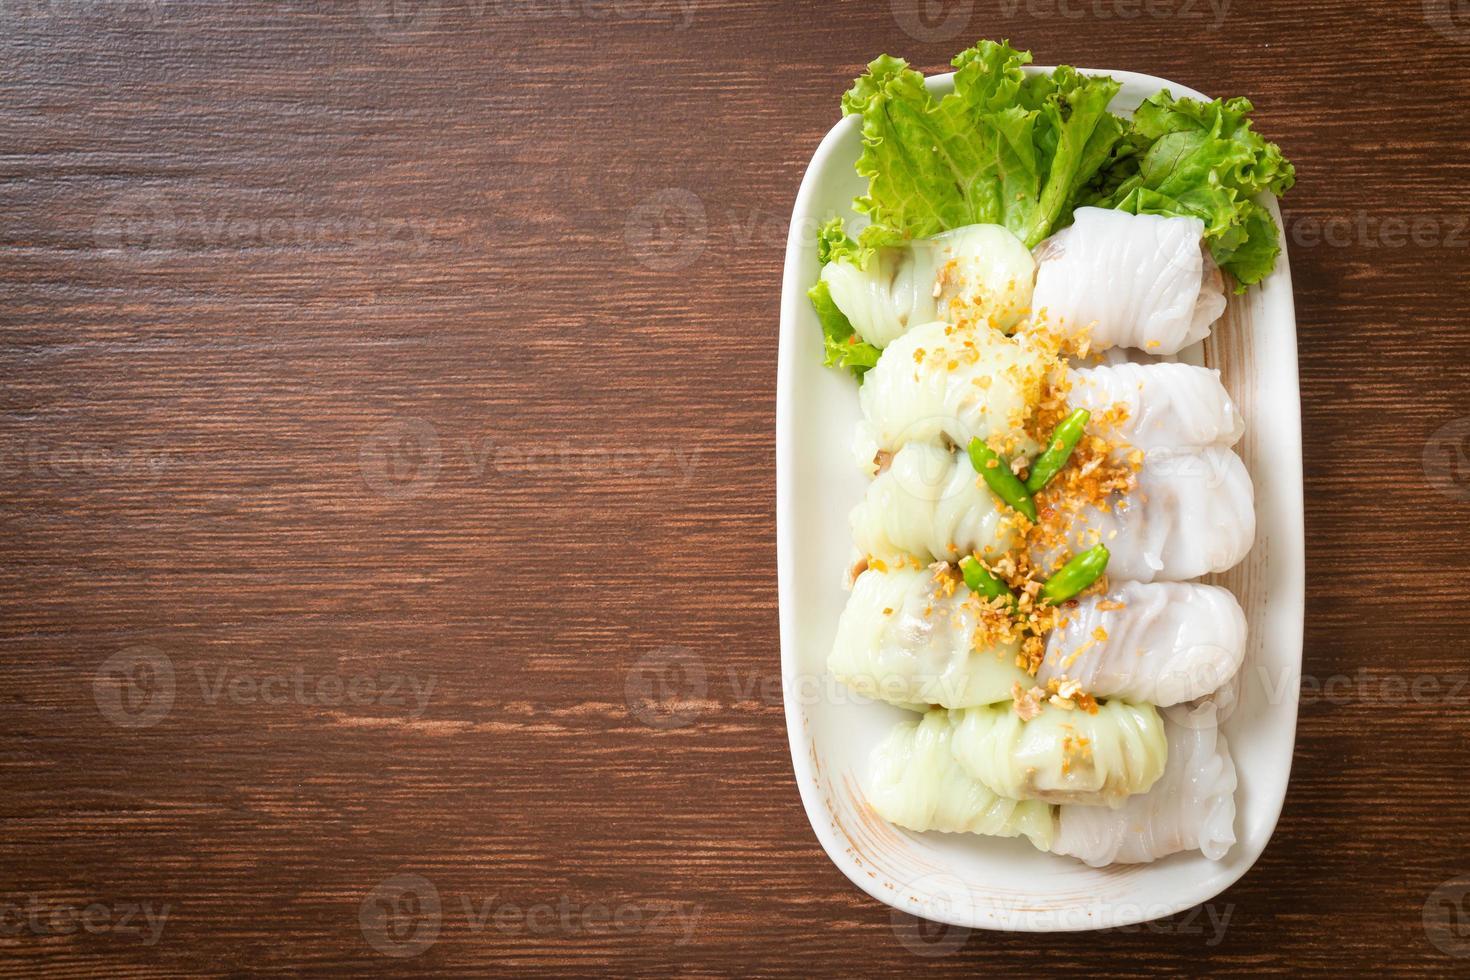 paquetes de arroz al vapor de cerdo foto